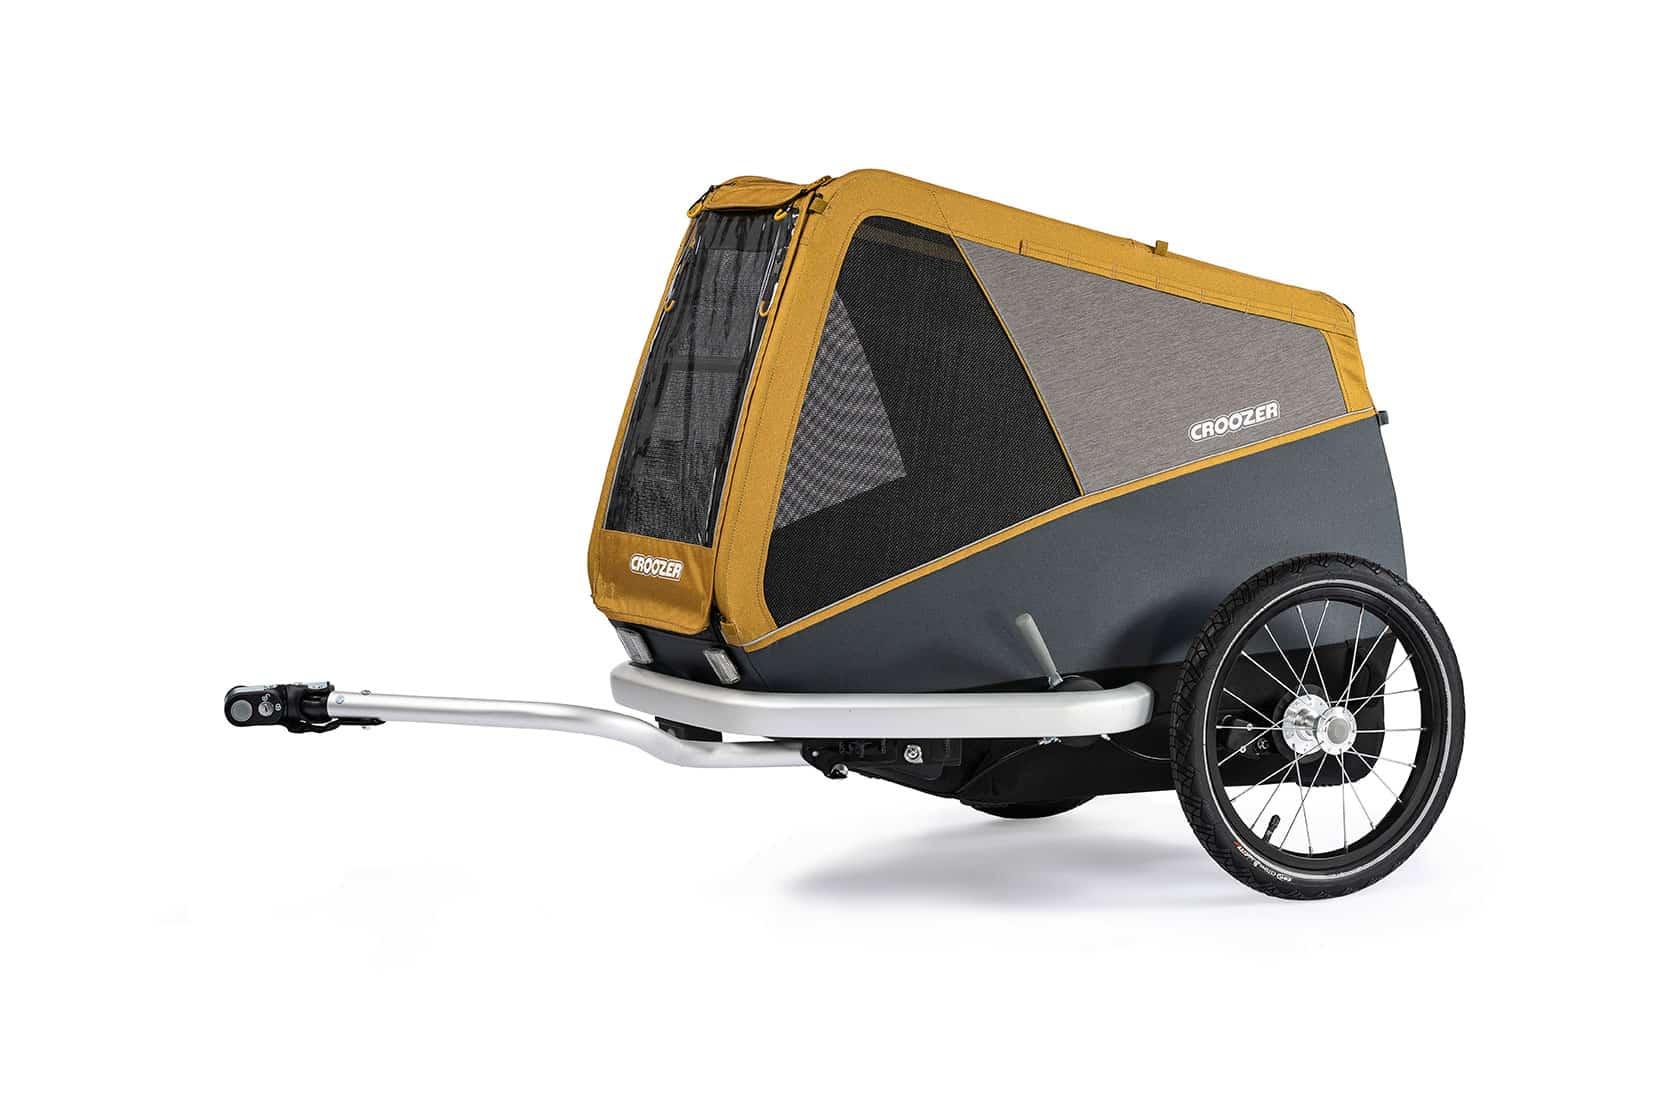 Croozer_Dog_Peppa_2020_Bike_web